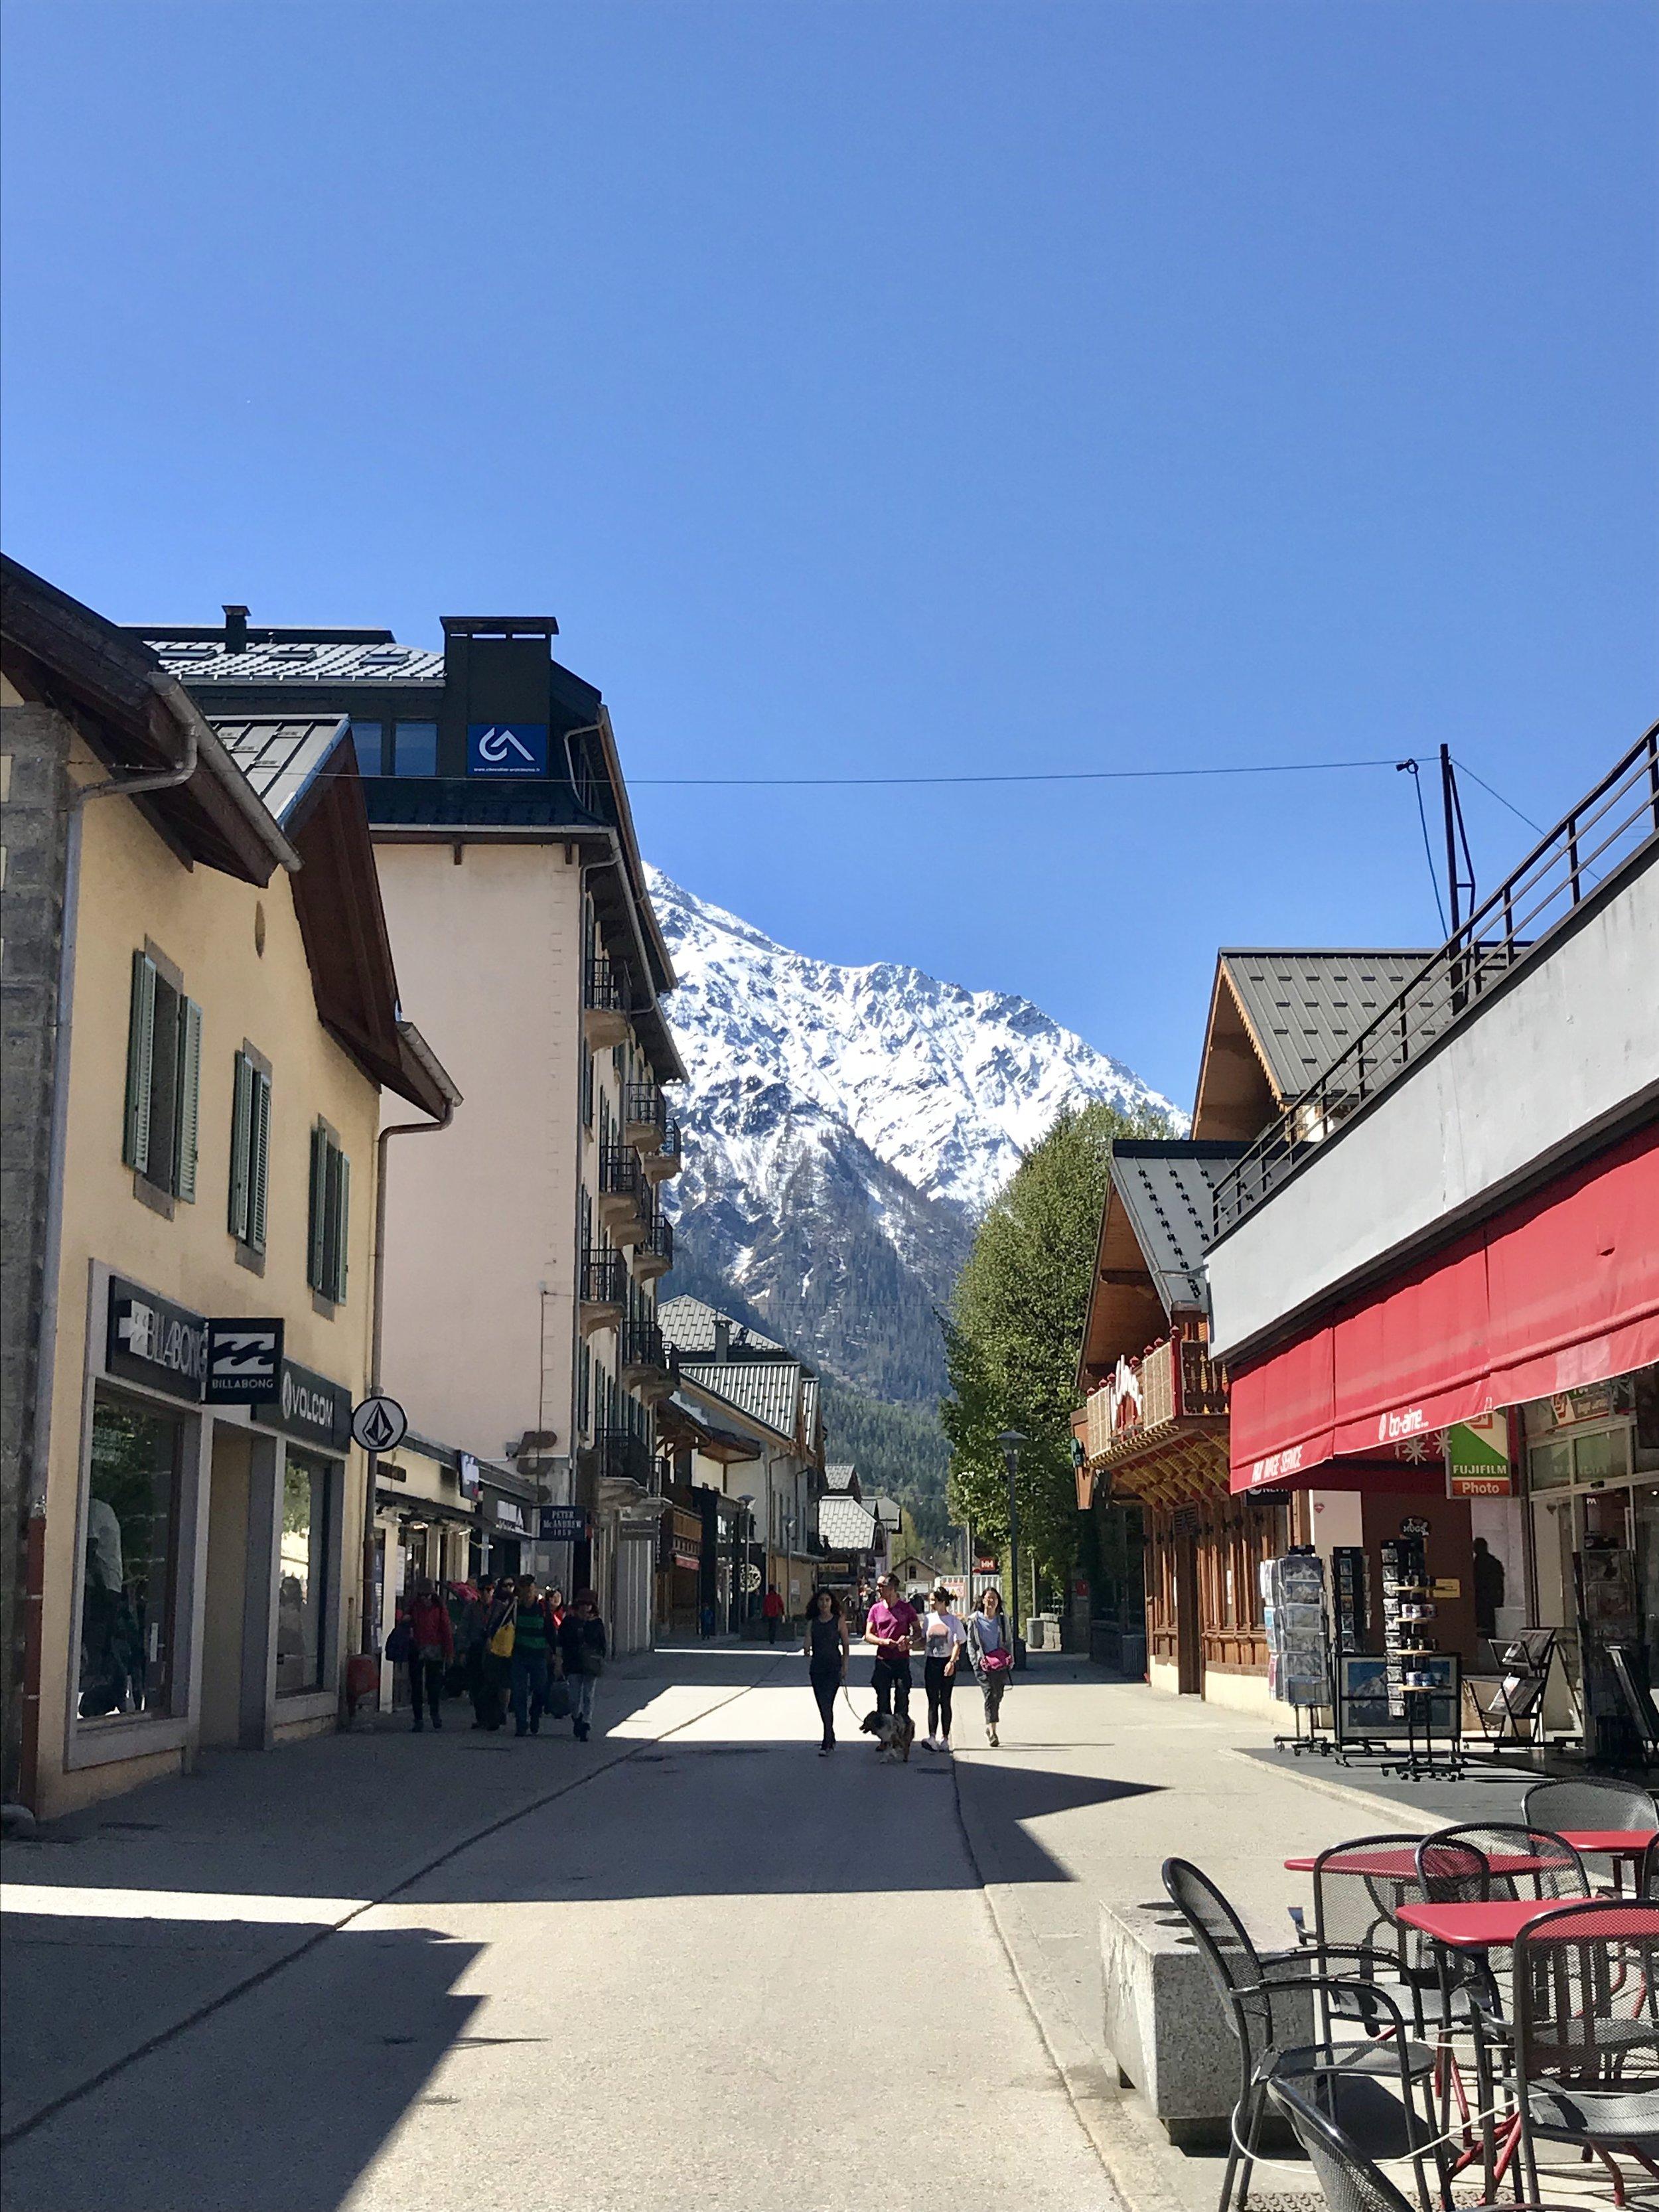 The charming ski town of Chamonix, France